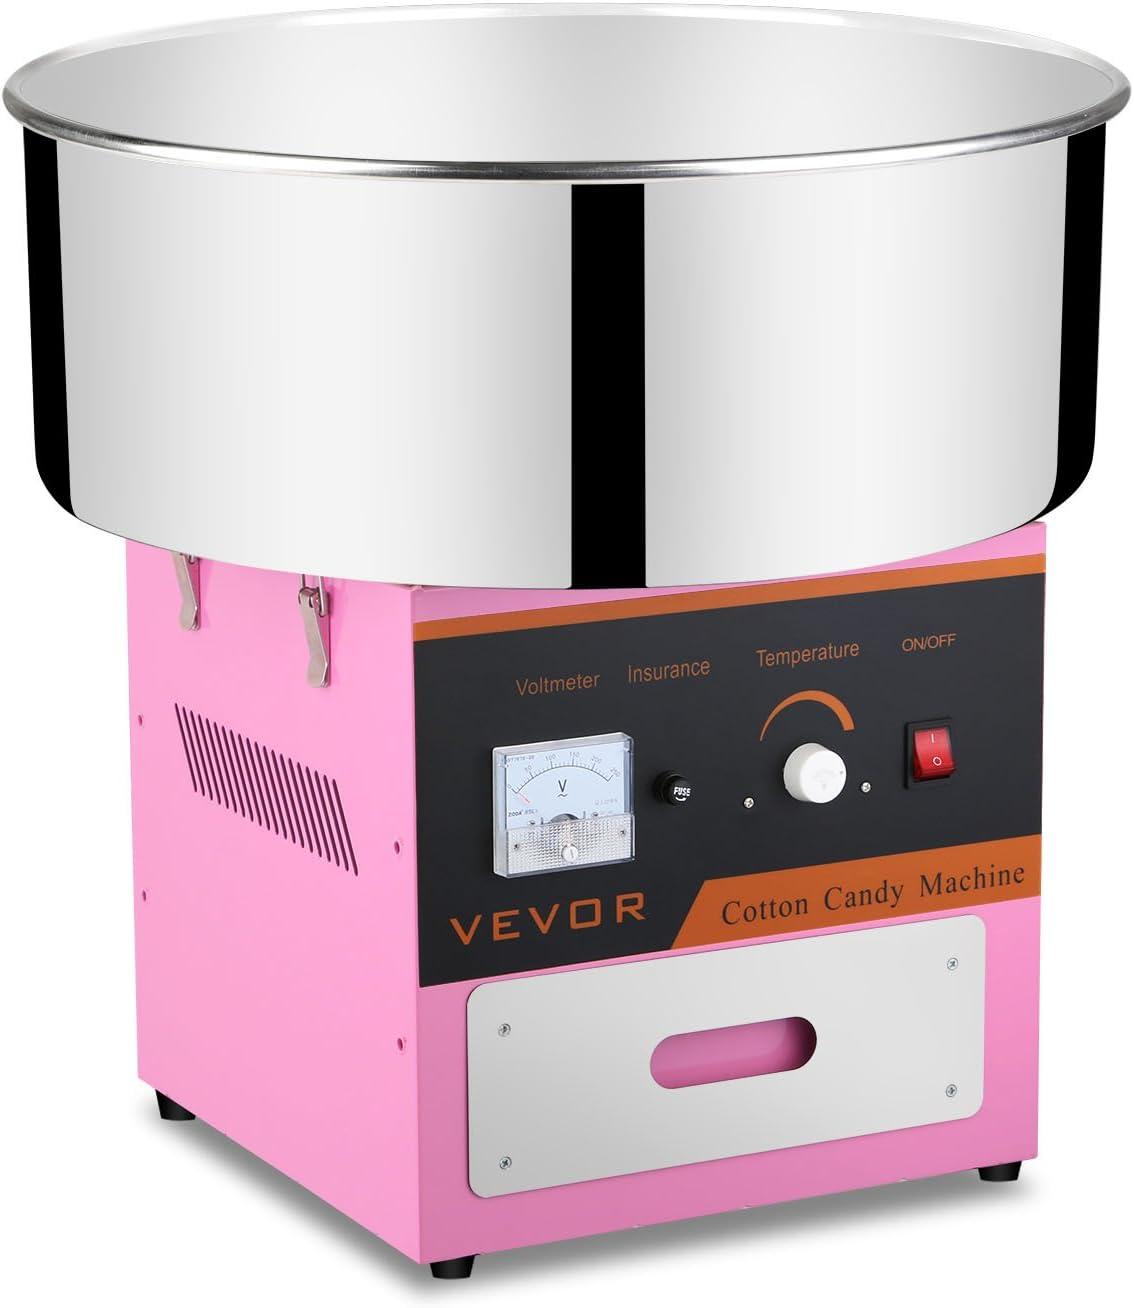 Autovictoria Máquina de Algodón de Azúcar Acero Inoxidable Máquina Eléctrica para hacer Algodón de Azúcar Cotton Candy Machine Commercial